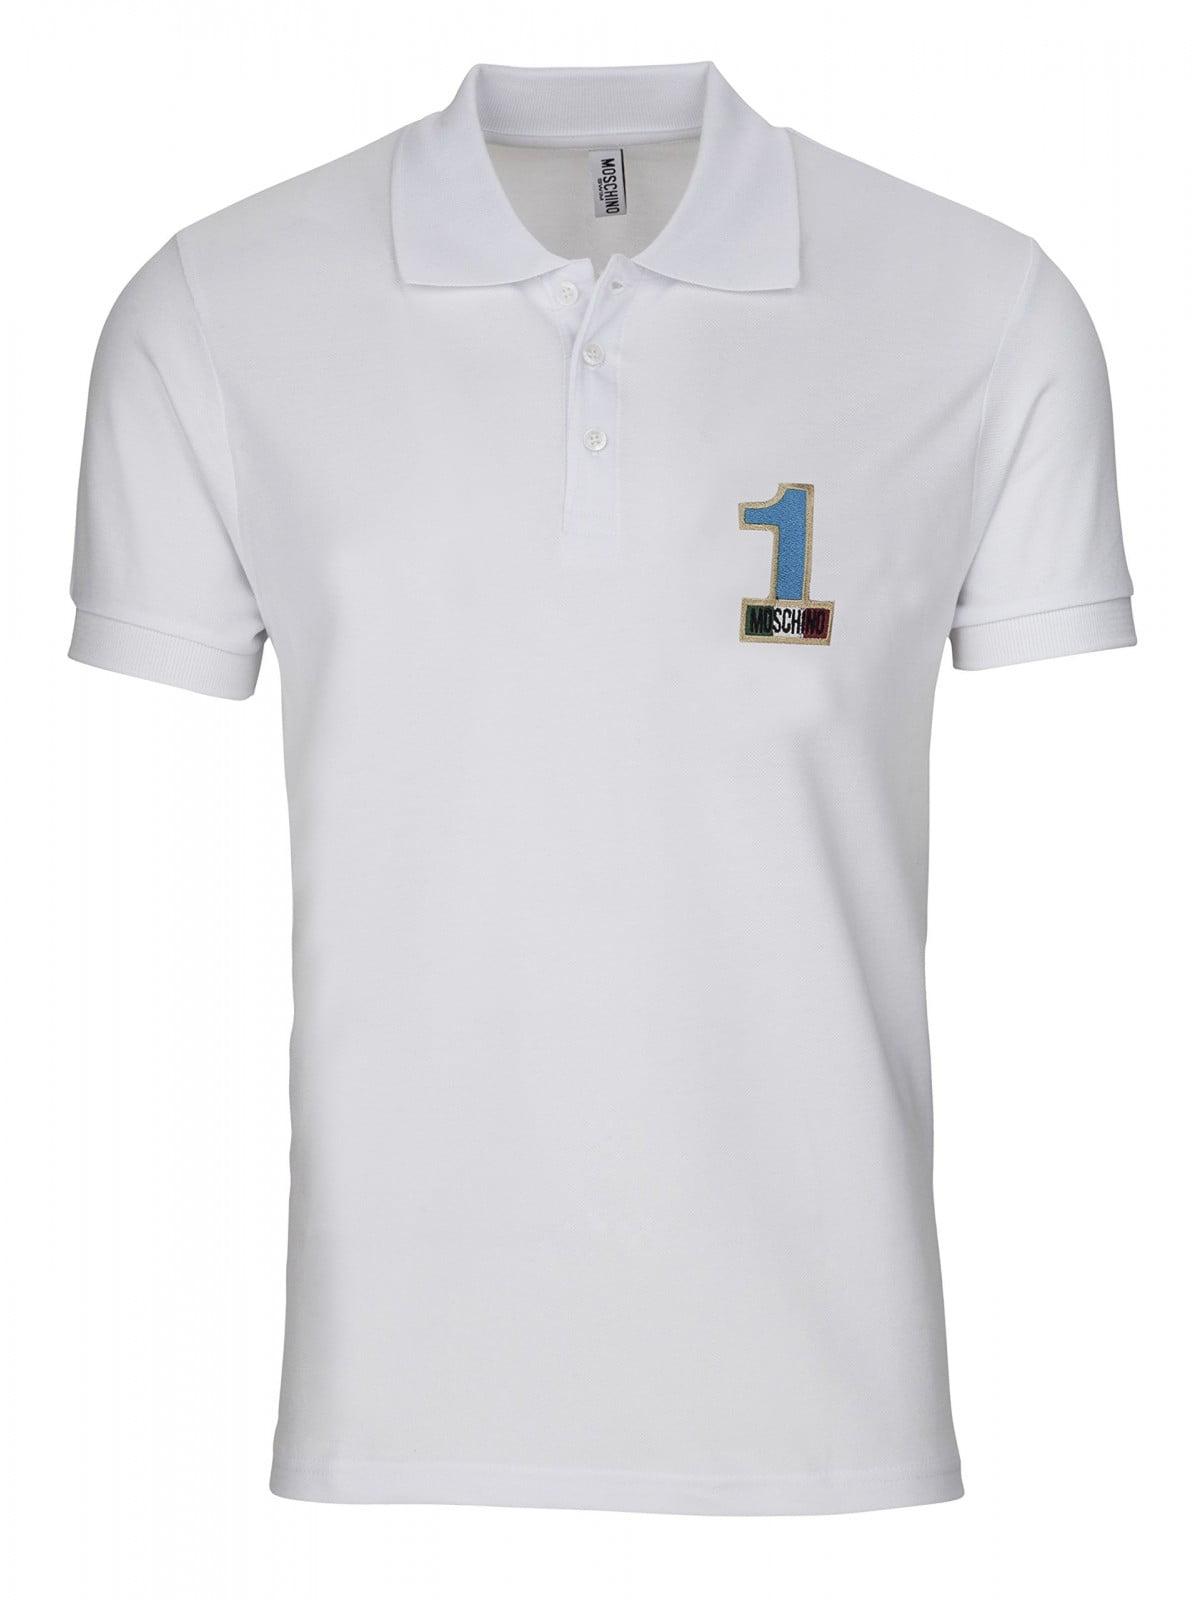 MOSCHINO Swim Mens #1 Polo Shirt